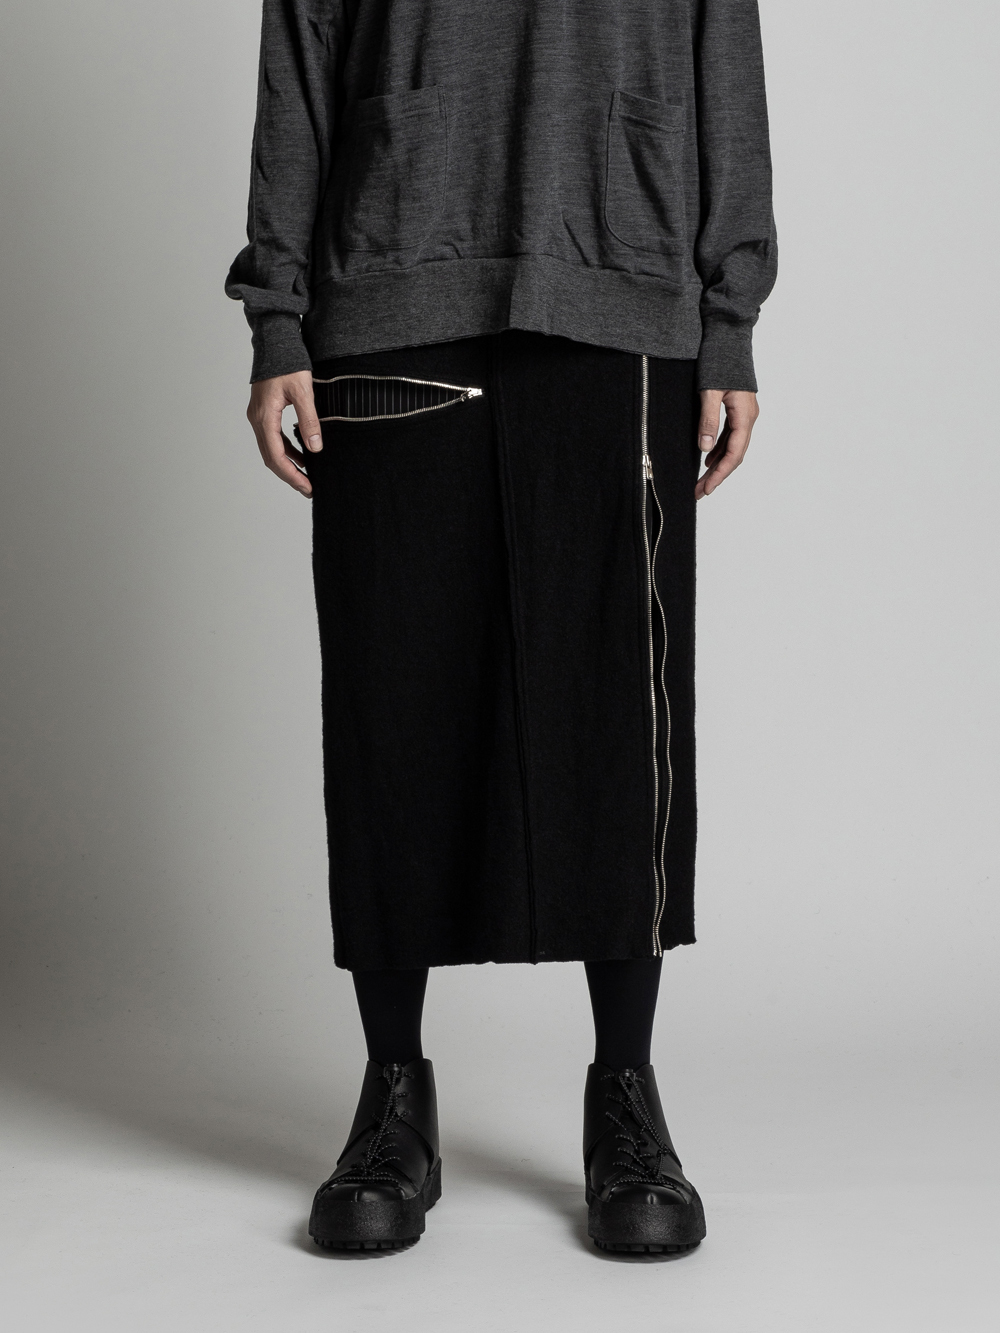 VI-3128-05 / 縮絨ウール ロングスカート